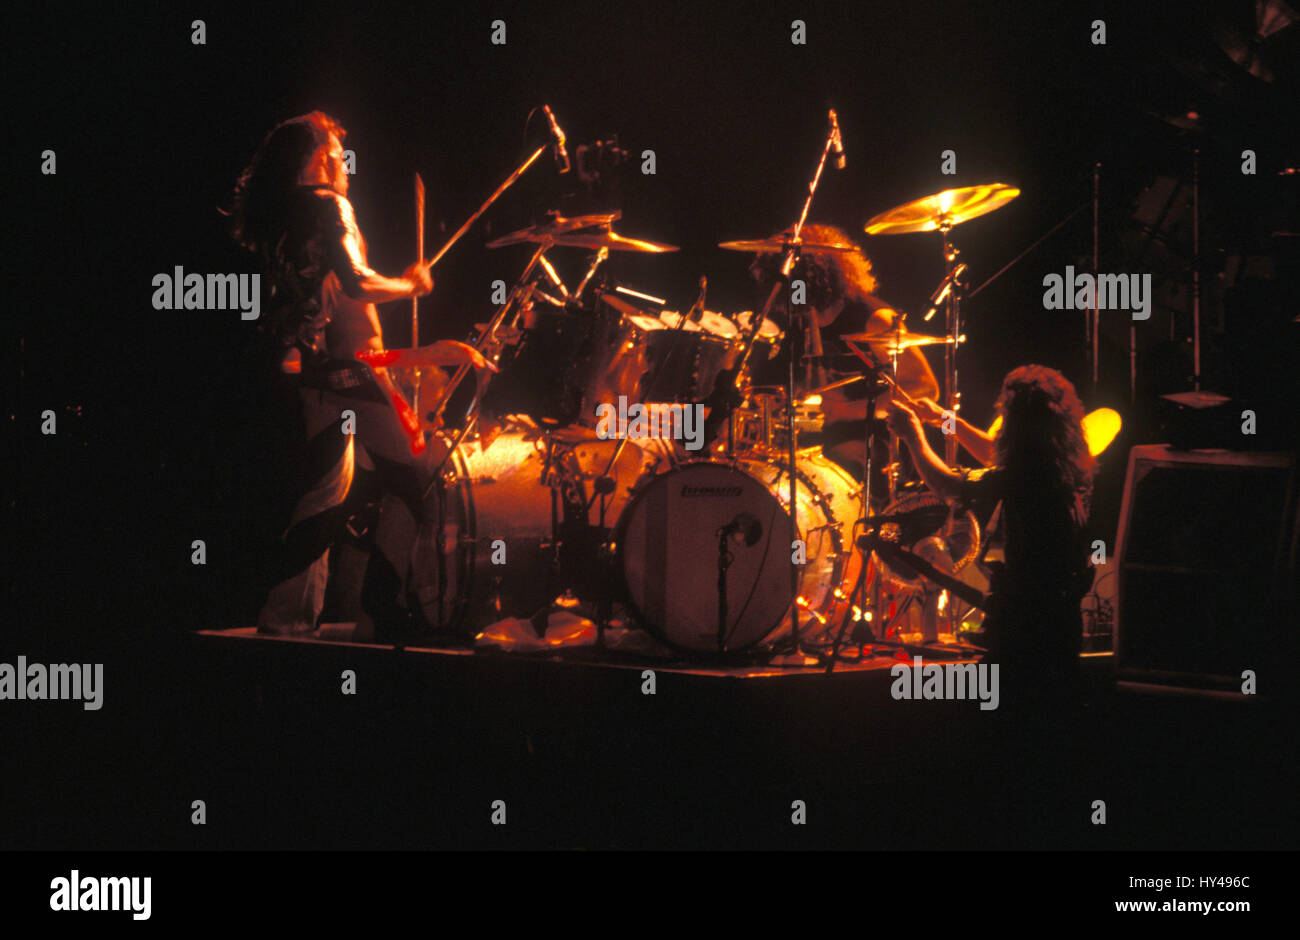 Van Halen The Classic Lineup Of David Lee Roth Edward Van Halen Stock Photo Alamy